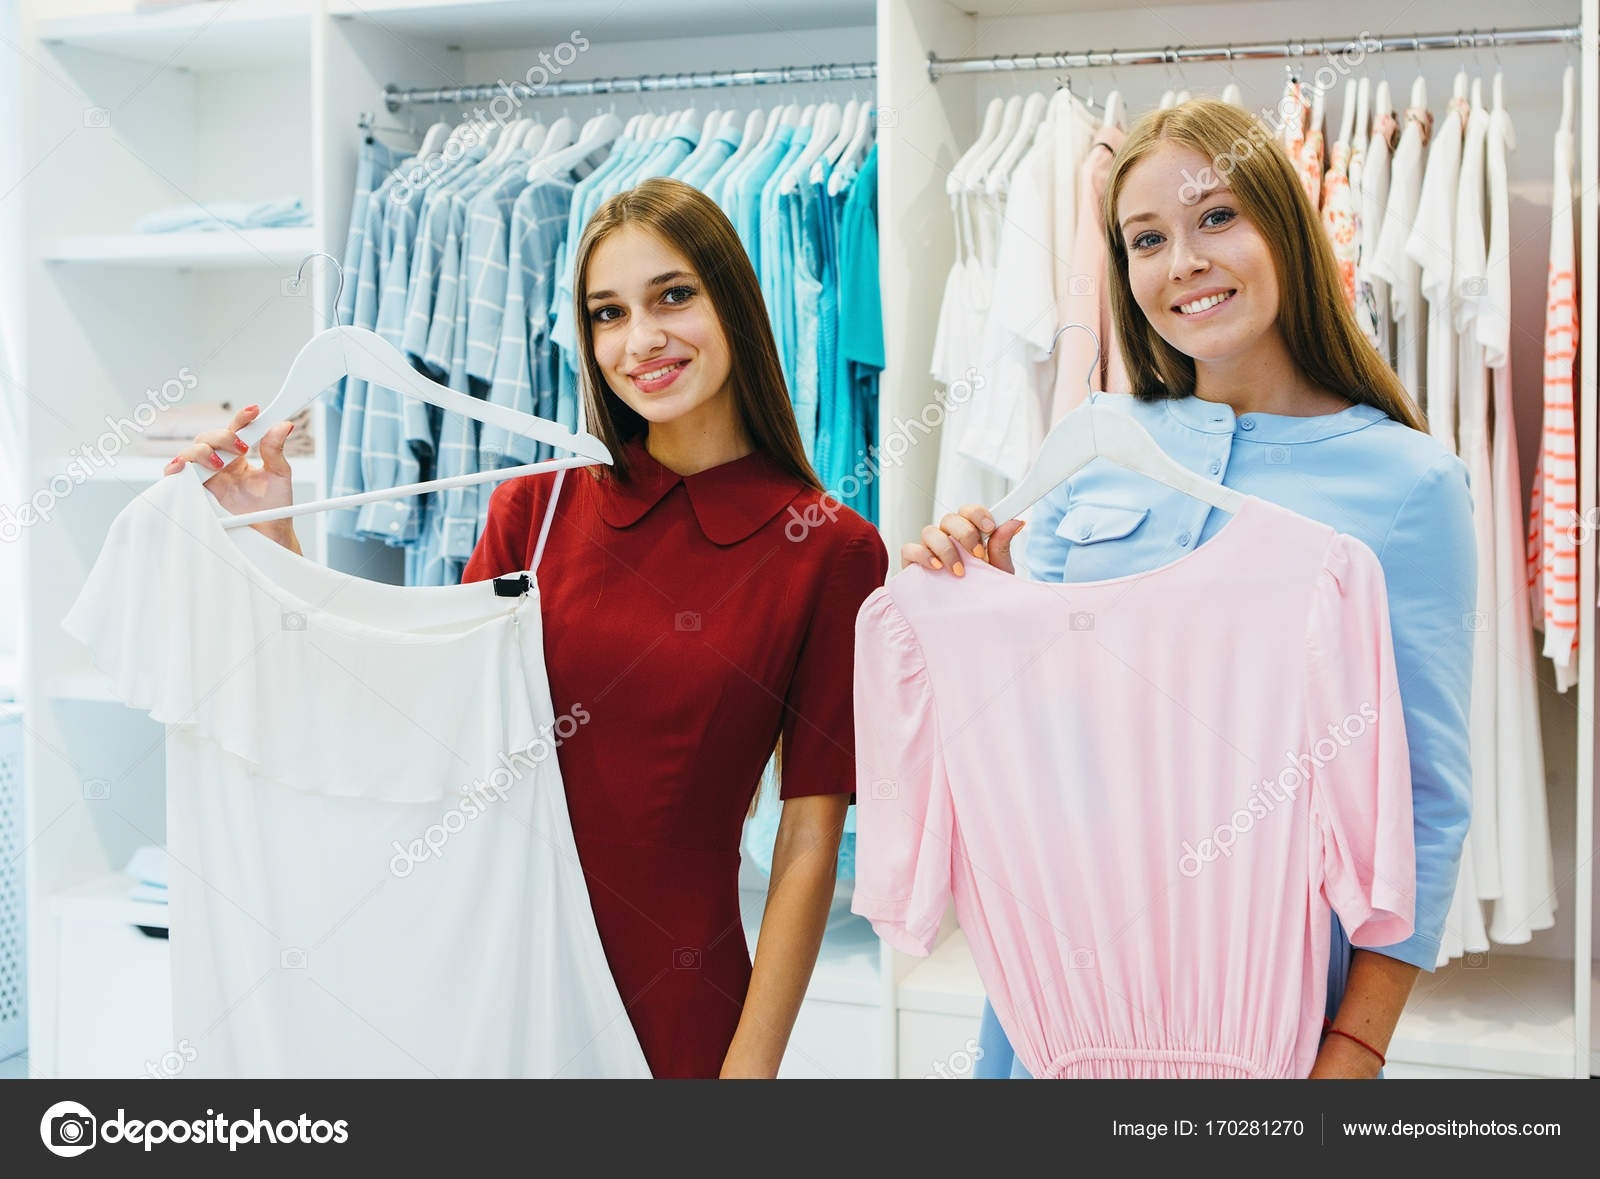 17 Großartig Kleider Shoppen Ärmel Genial Kleider Shoppen Galerie